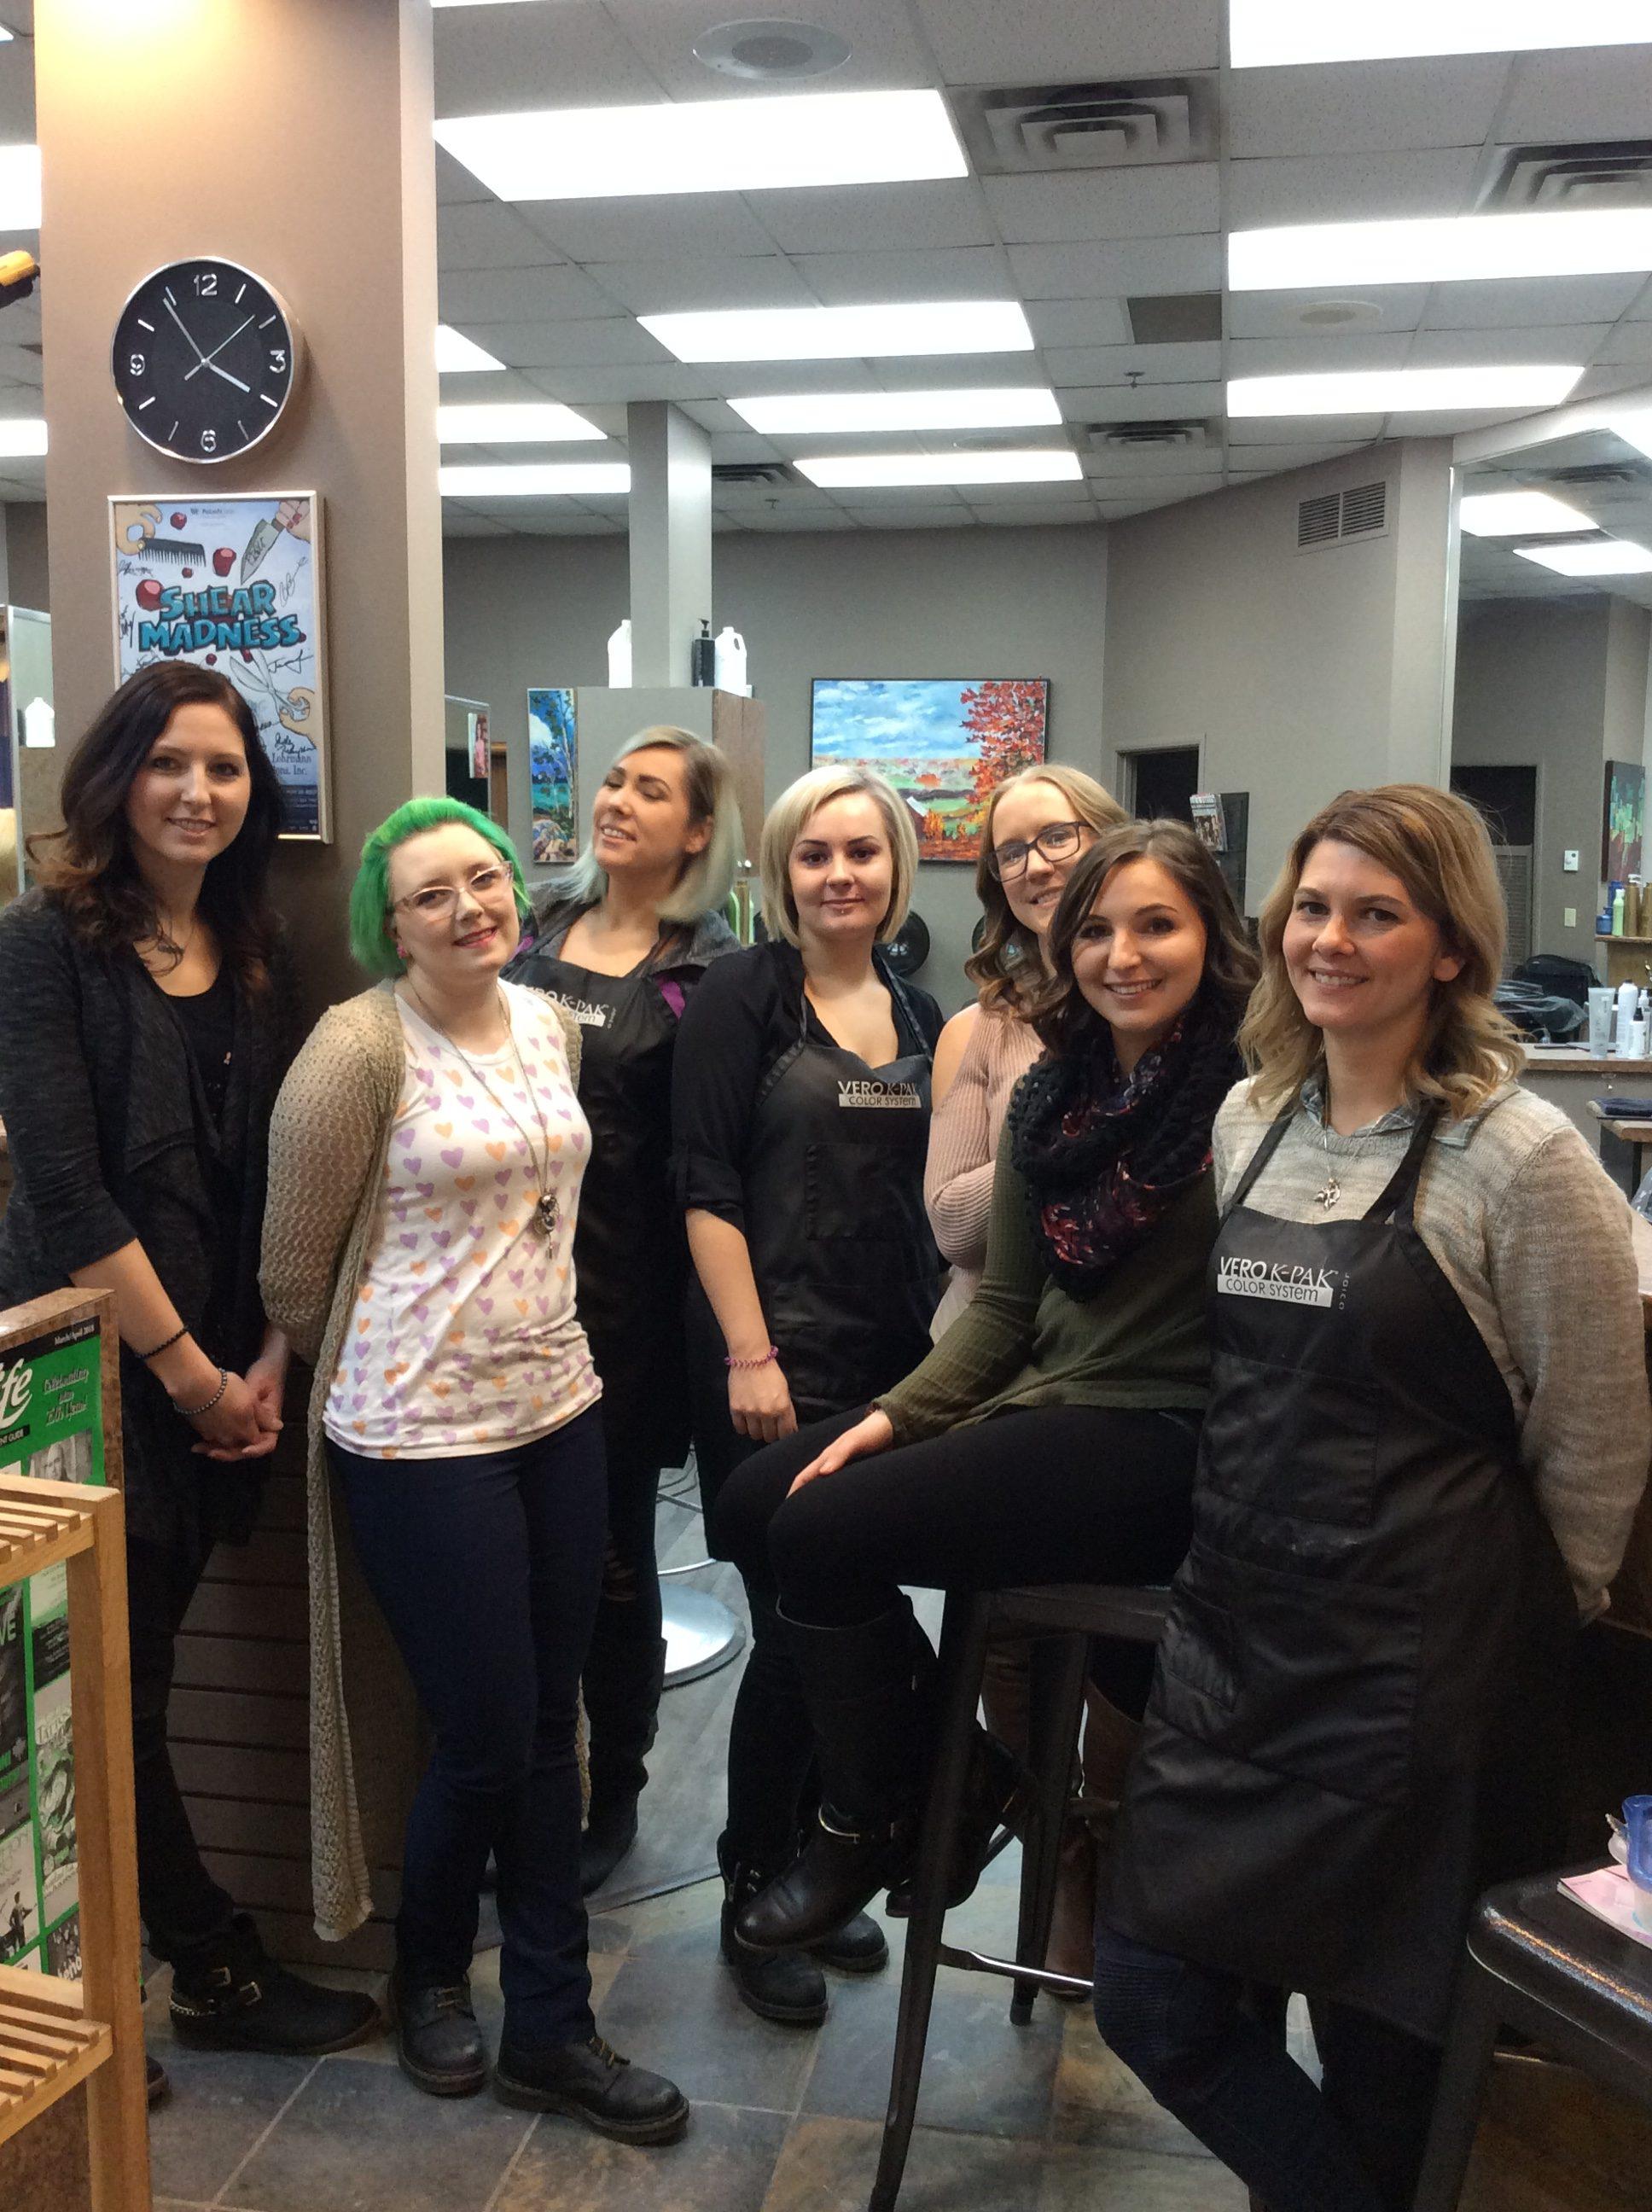 Team hairdressers at hairstyle inn saskatoon